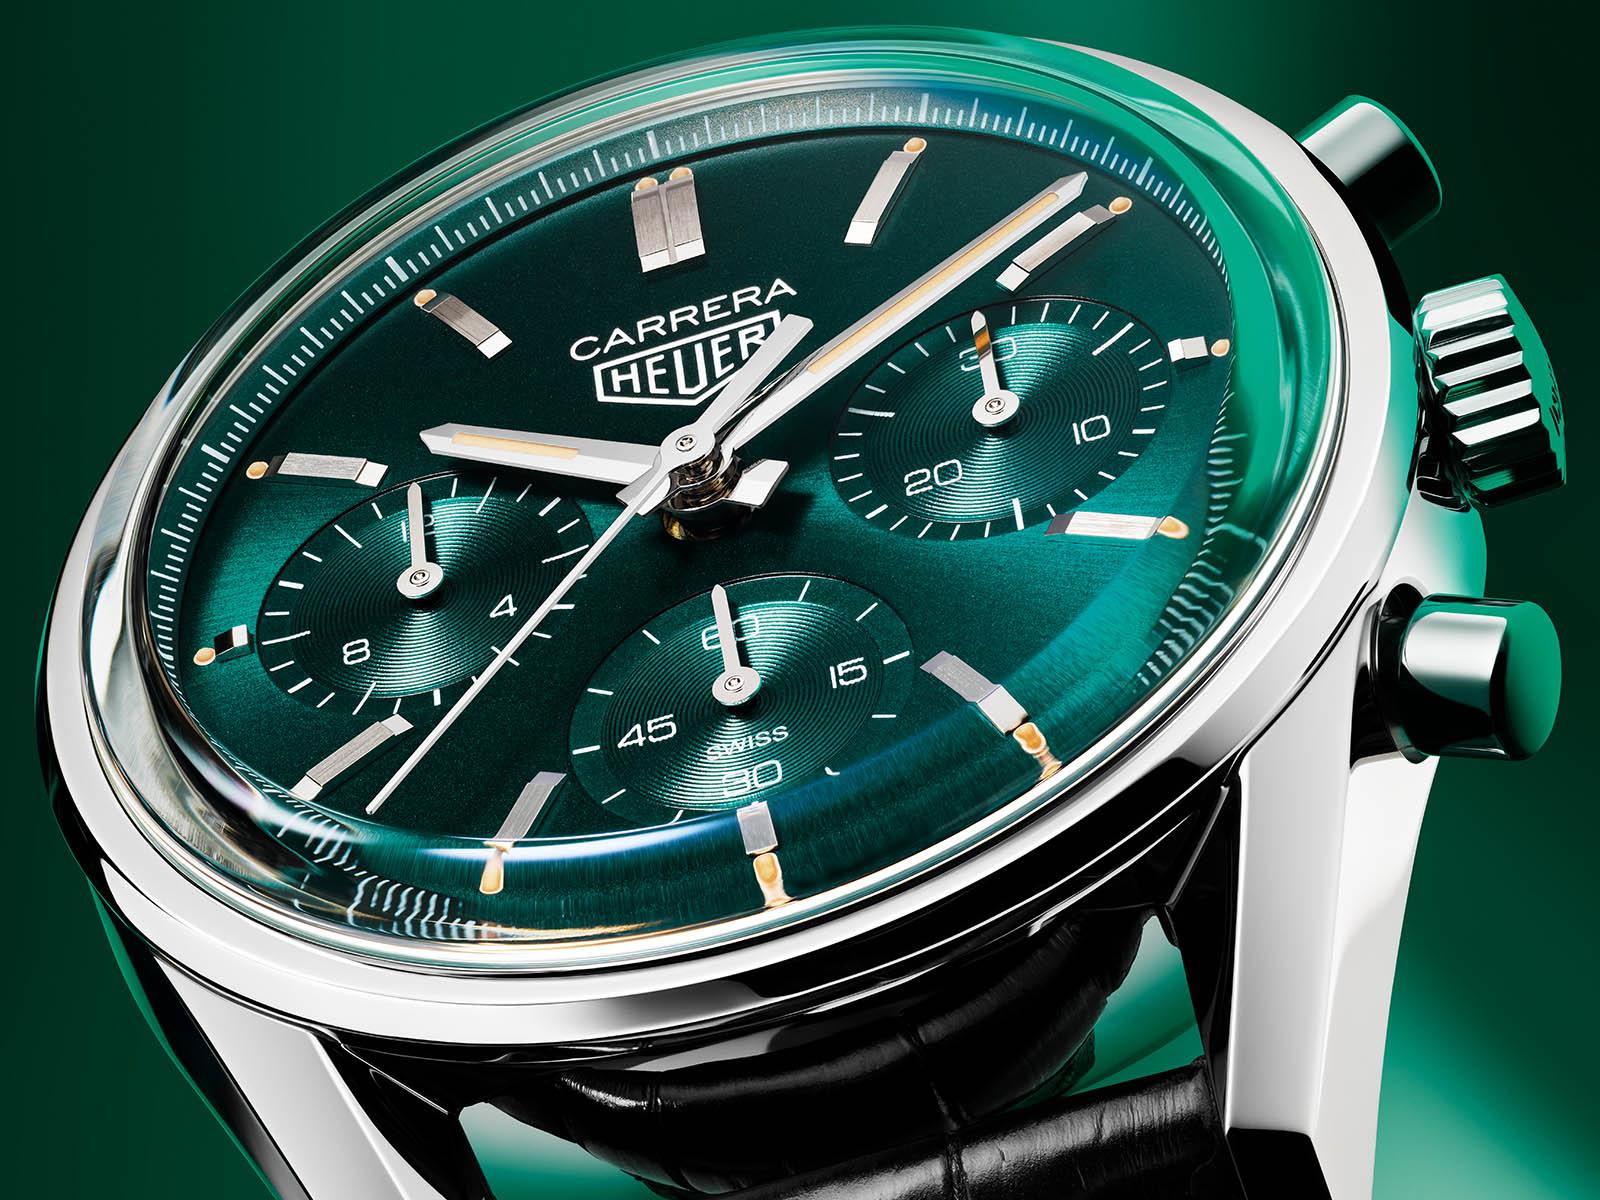 cbk221f-fc6479-tag-heuer-carrera-green-special-edition-2.jpg